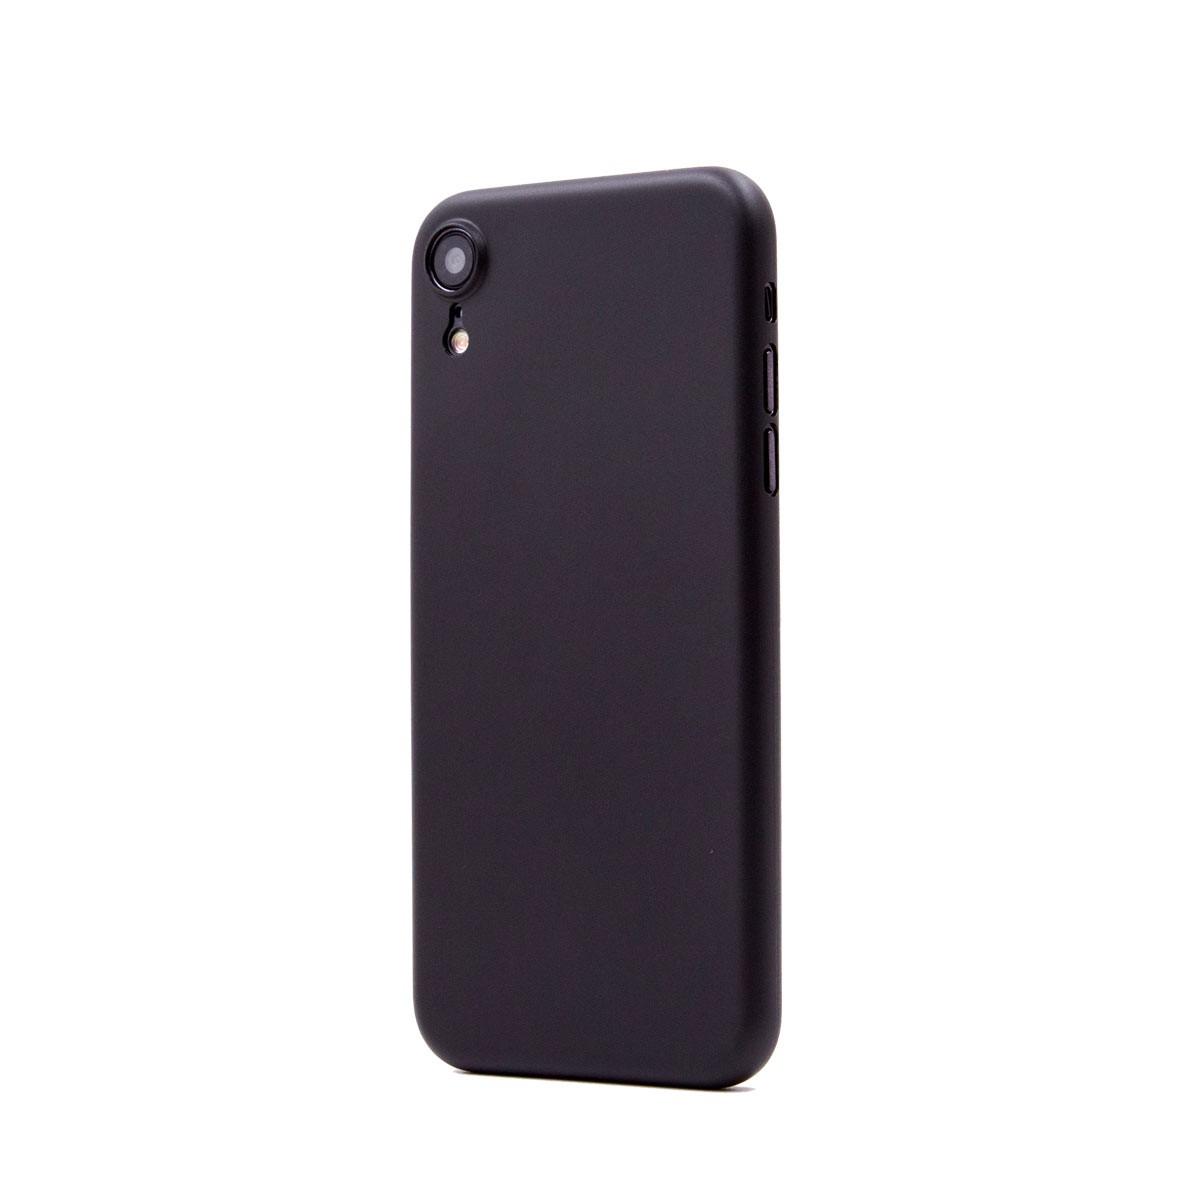 Capac protectie spate cellara colectia thin pentru iphone xr - negru